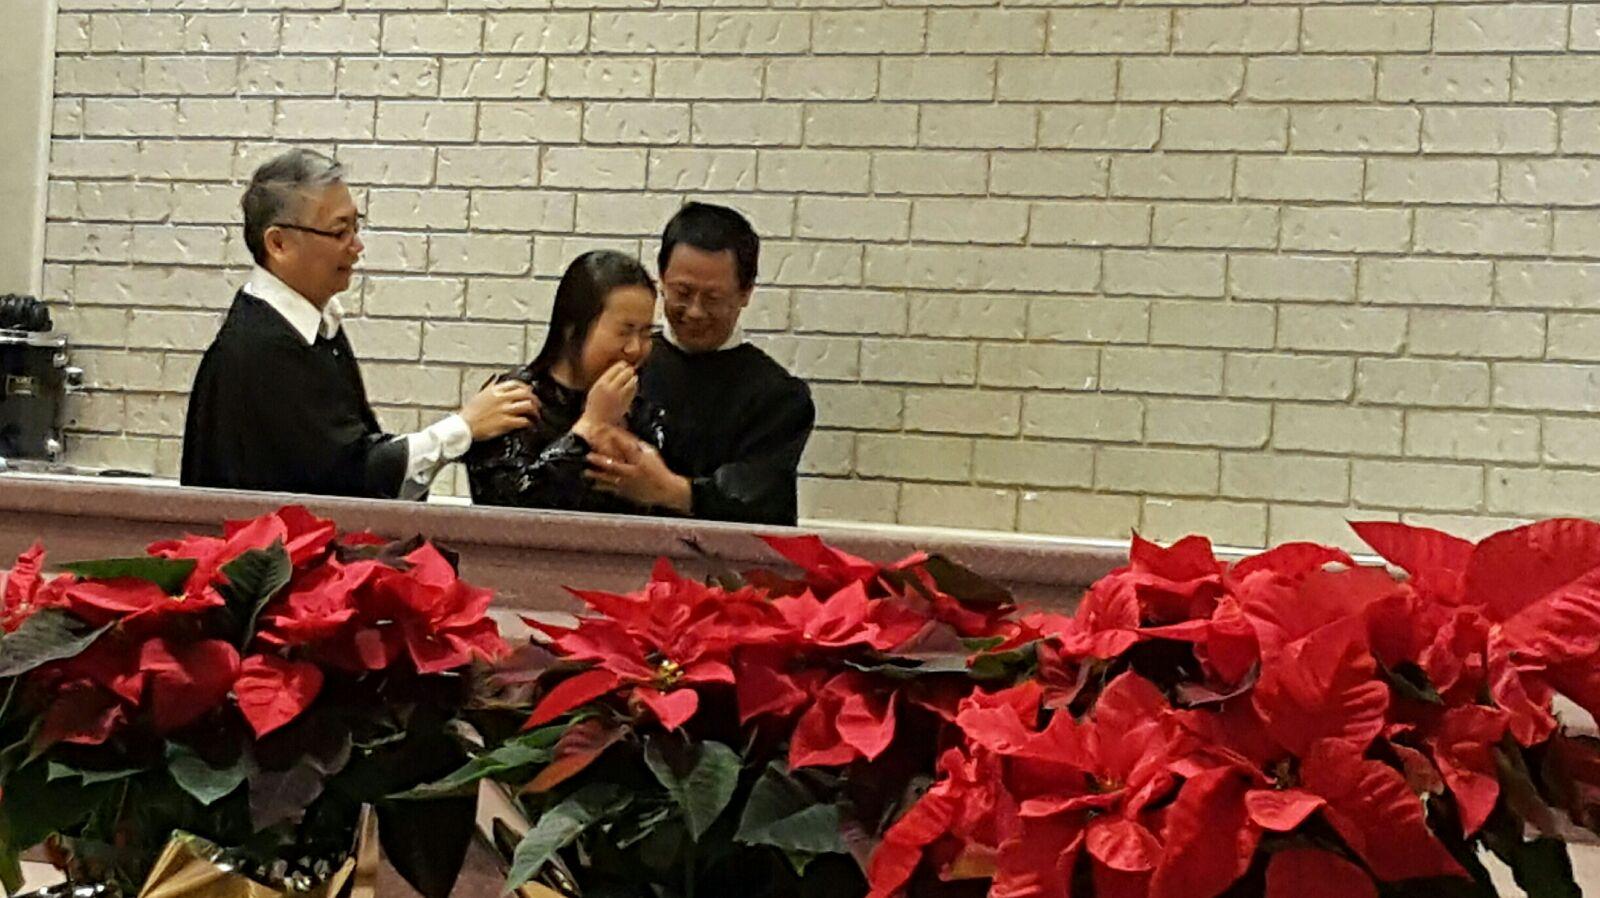 teresa-chan-baptism-day-december-11-2016